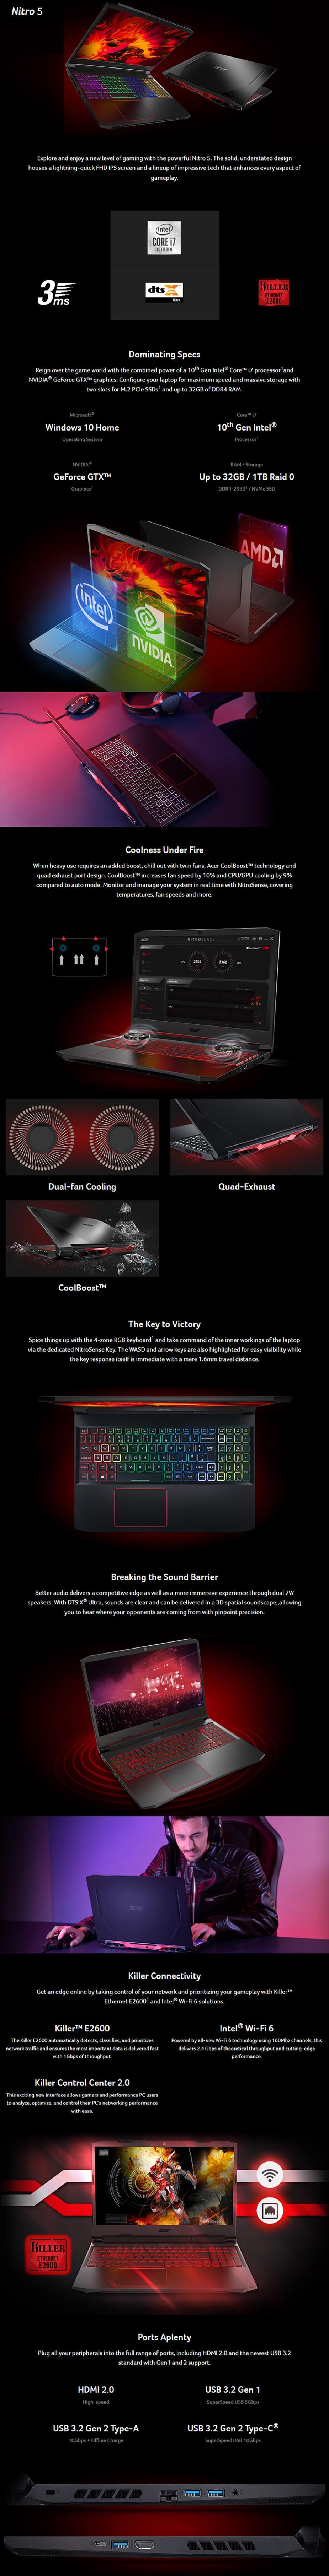 "Acer Nitro 5 15.6"" Laptop i7-10750H 16GB 512GB GTX1650Ti Win10 Home - Overview 1"